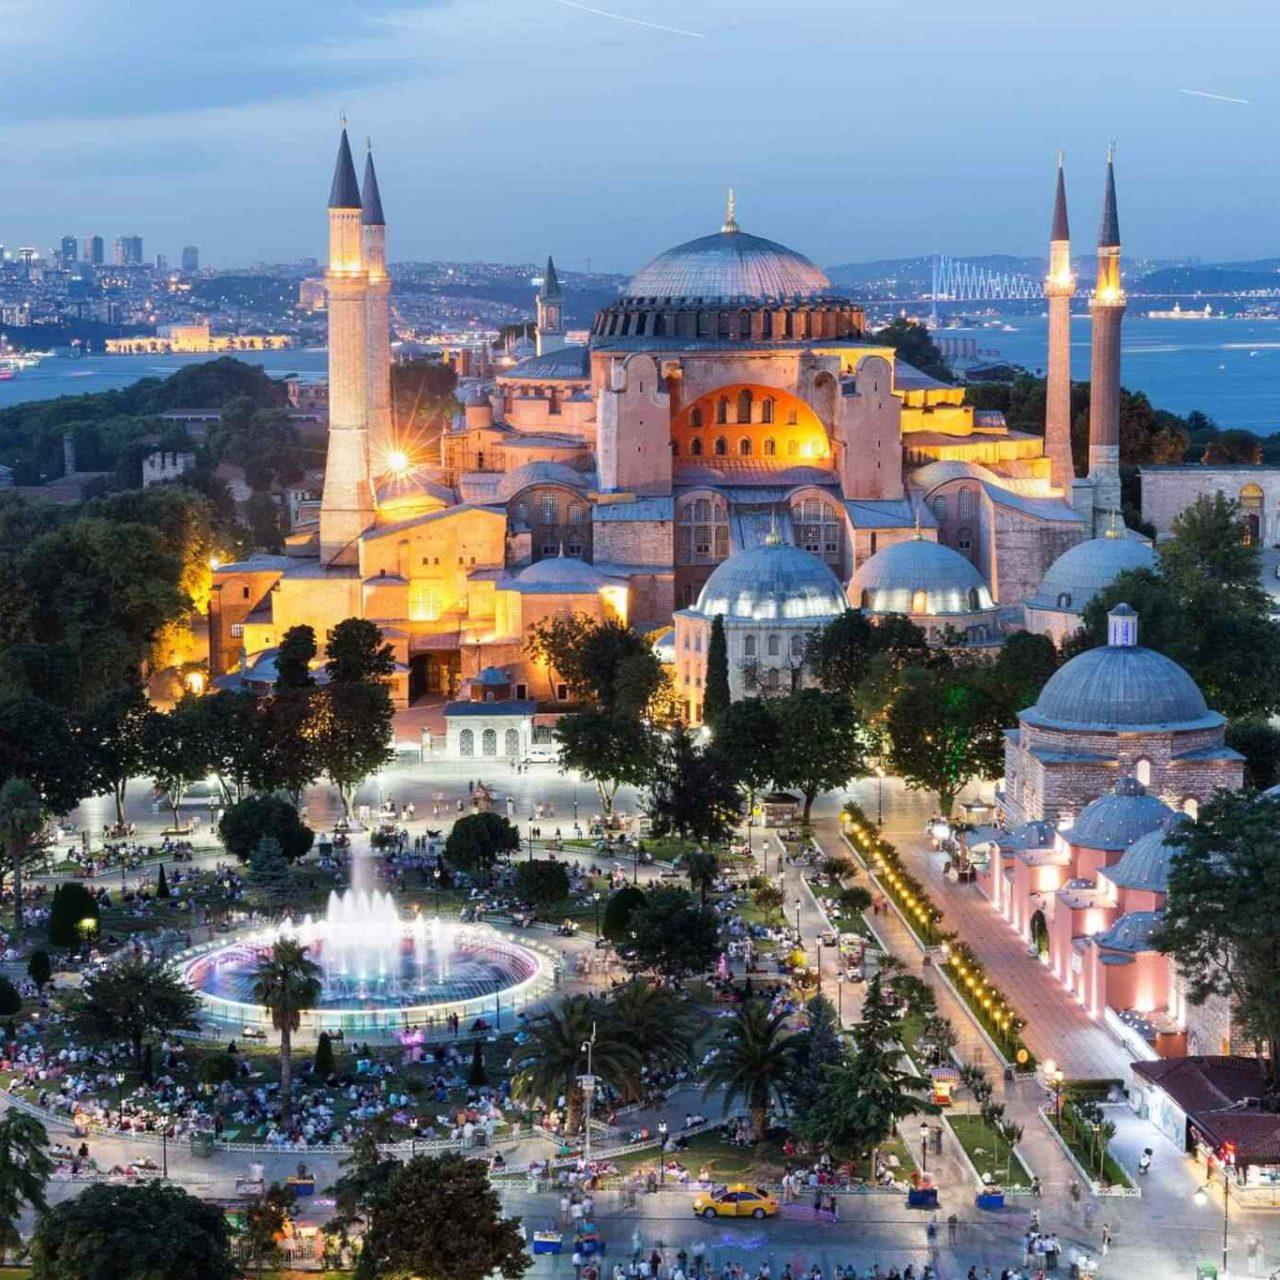 https://classictourbg.com/wp-content/uploads/2018/09/destination-istanbul-02-1280x1280.jpg